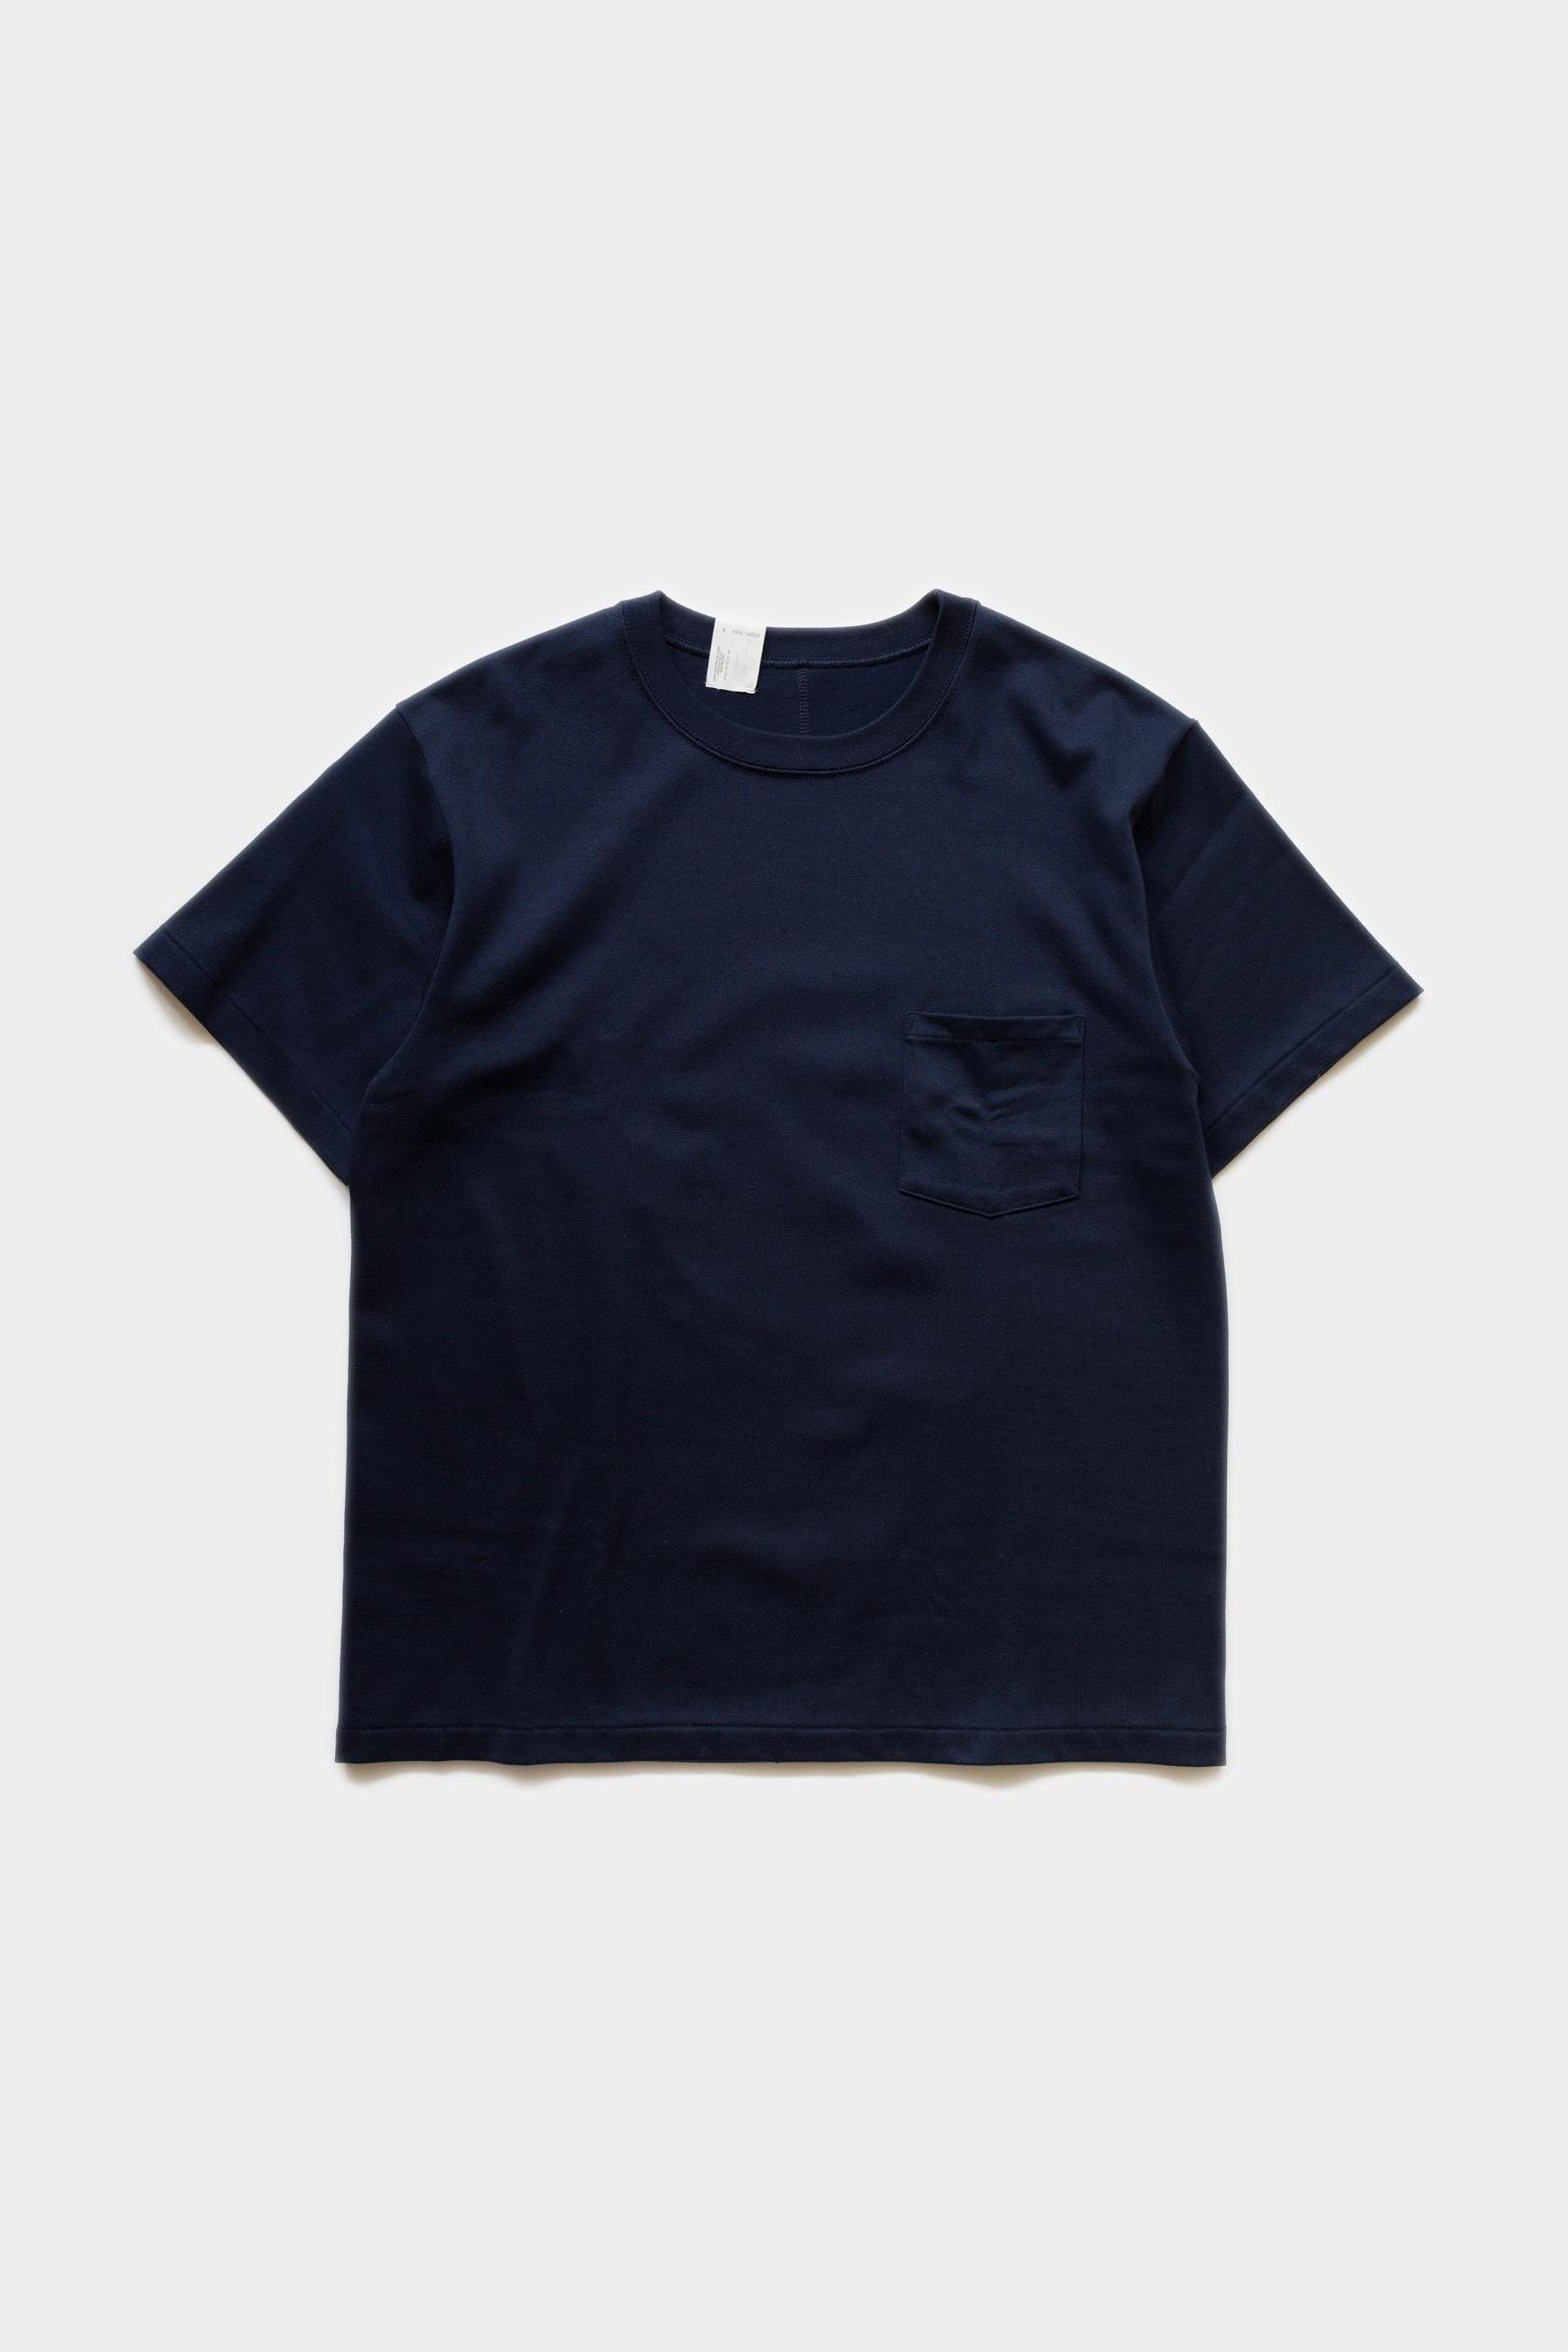 【N.HOOLYWOOD(エヌハリウッド)】 クルーネックTシャツ(16 RCH)